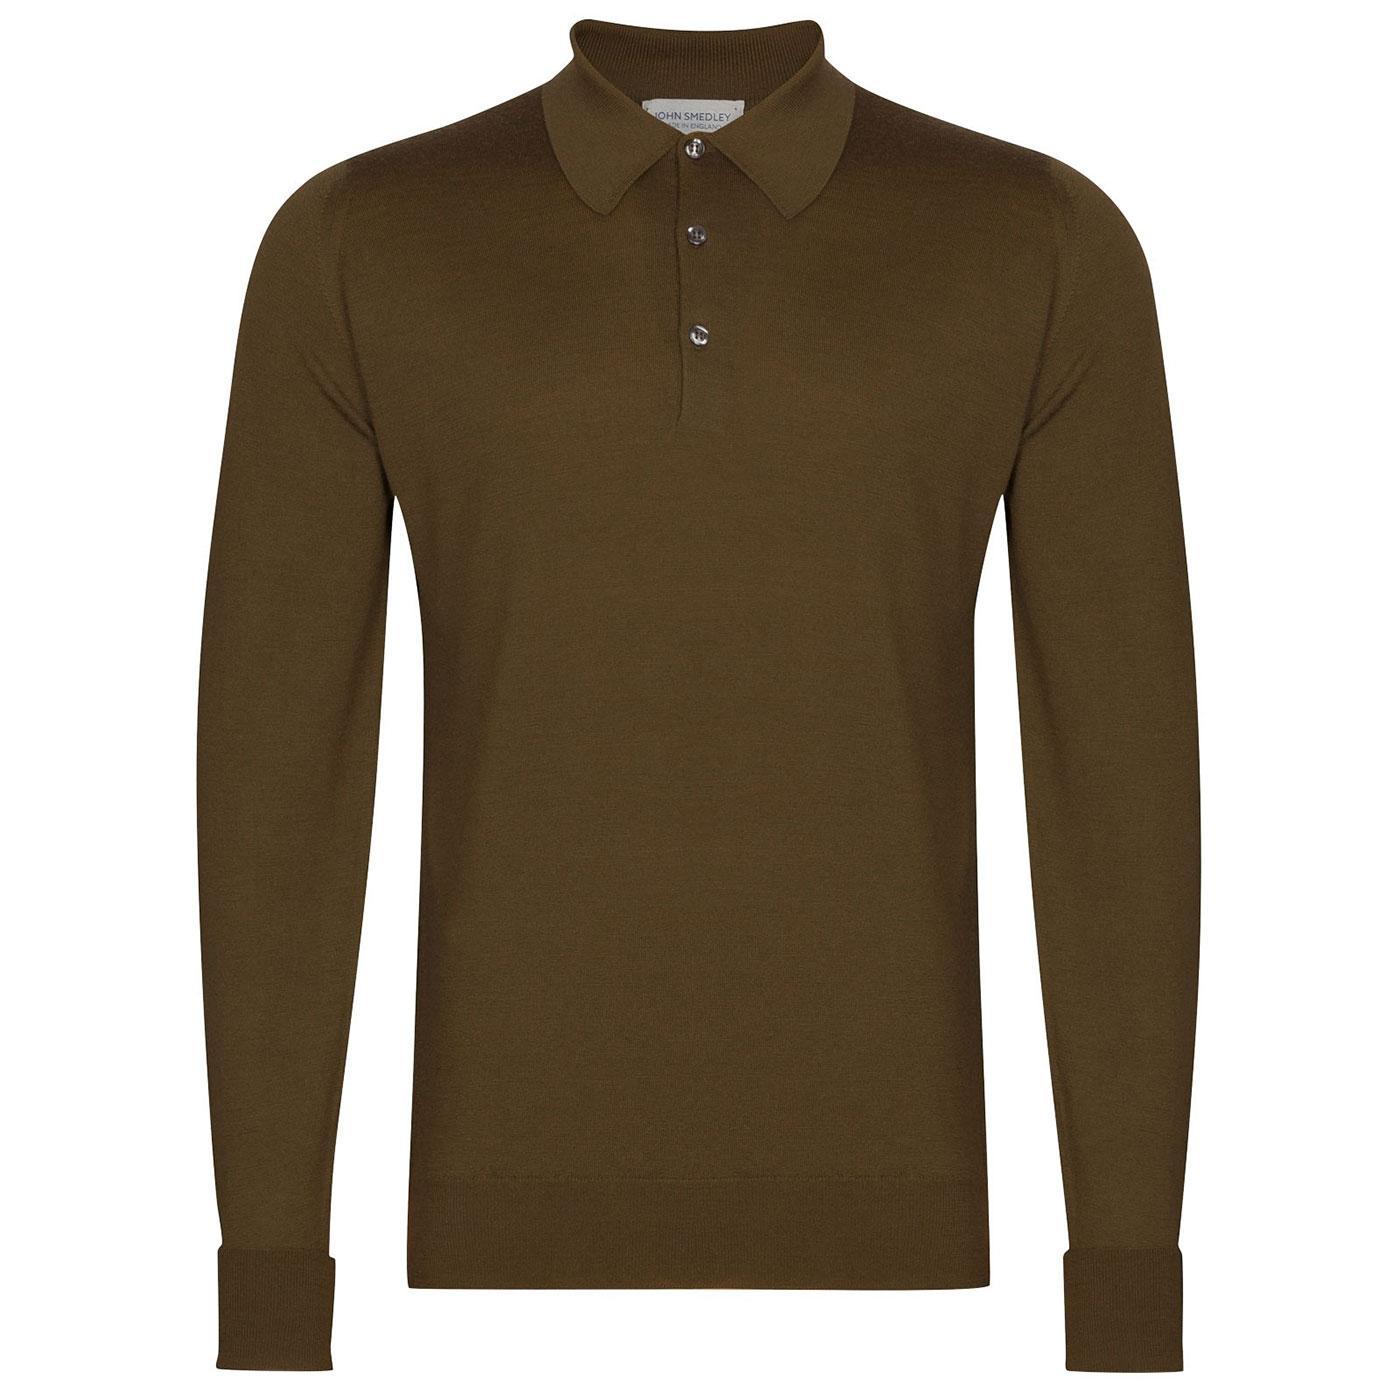 Dorset JOHN SMEDLEY Knitted Wool Mod Polo Shirt Kh